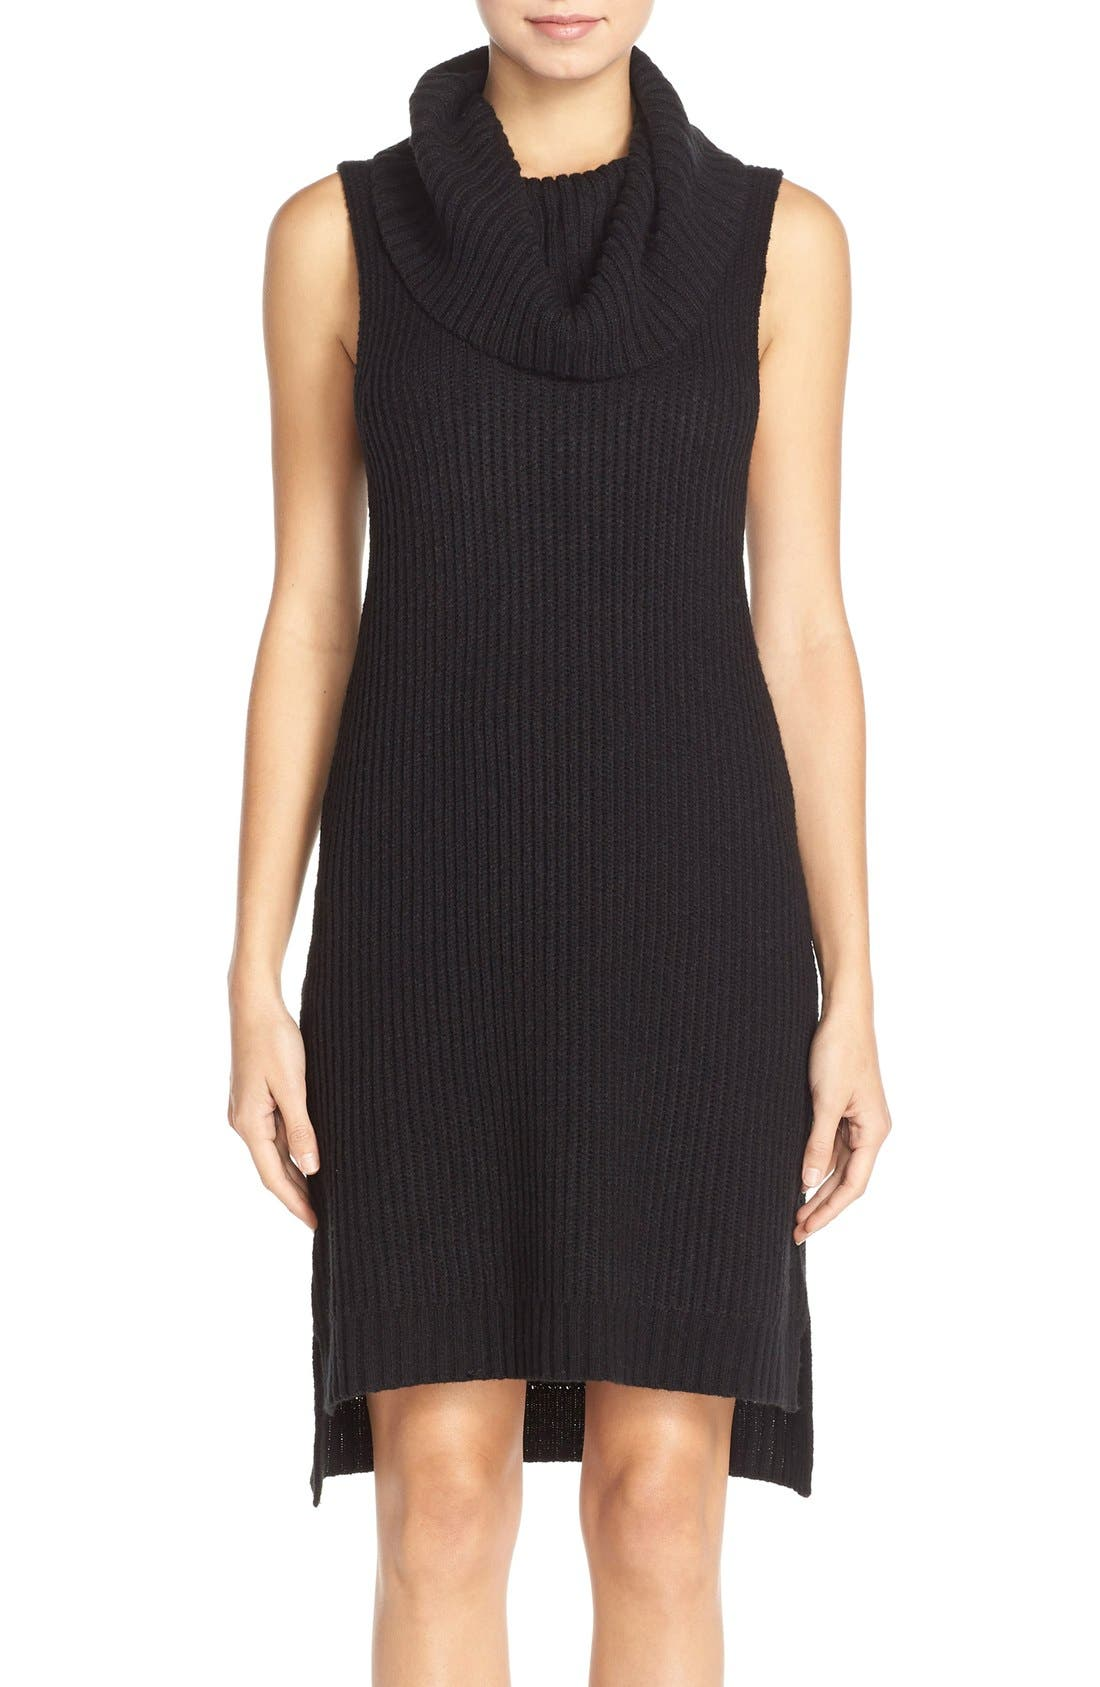 Alternate Image 1 Selected - BB Dakota 'Marisa' Turtleneck Sweater Dress